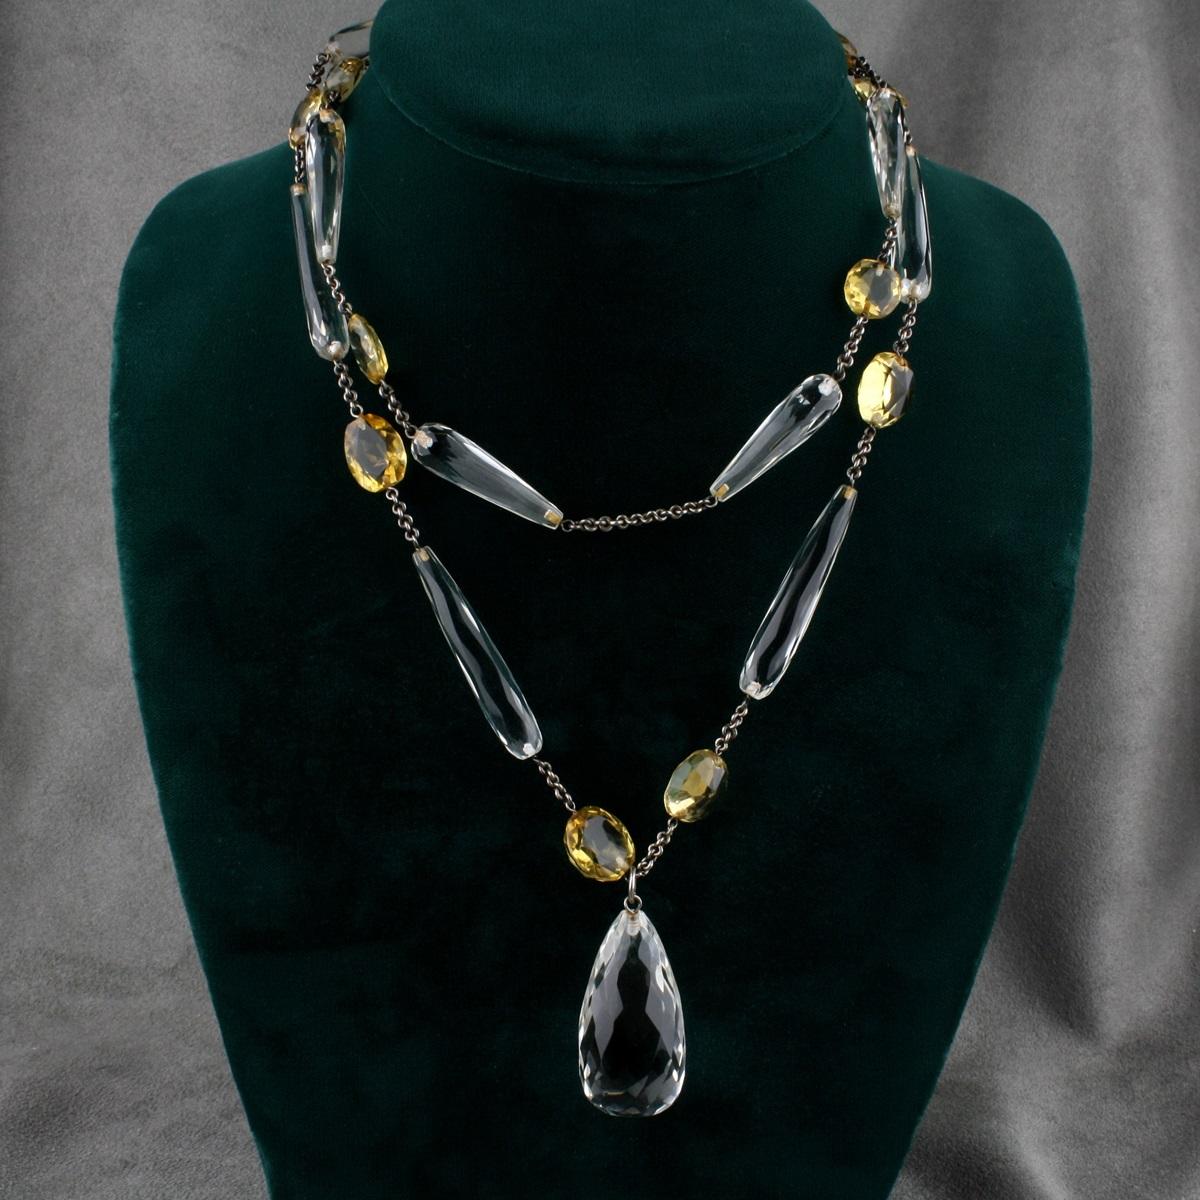 Vintage Sterling Silver Rock Crystal and Citrine Necklace